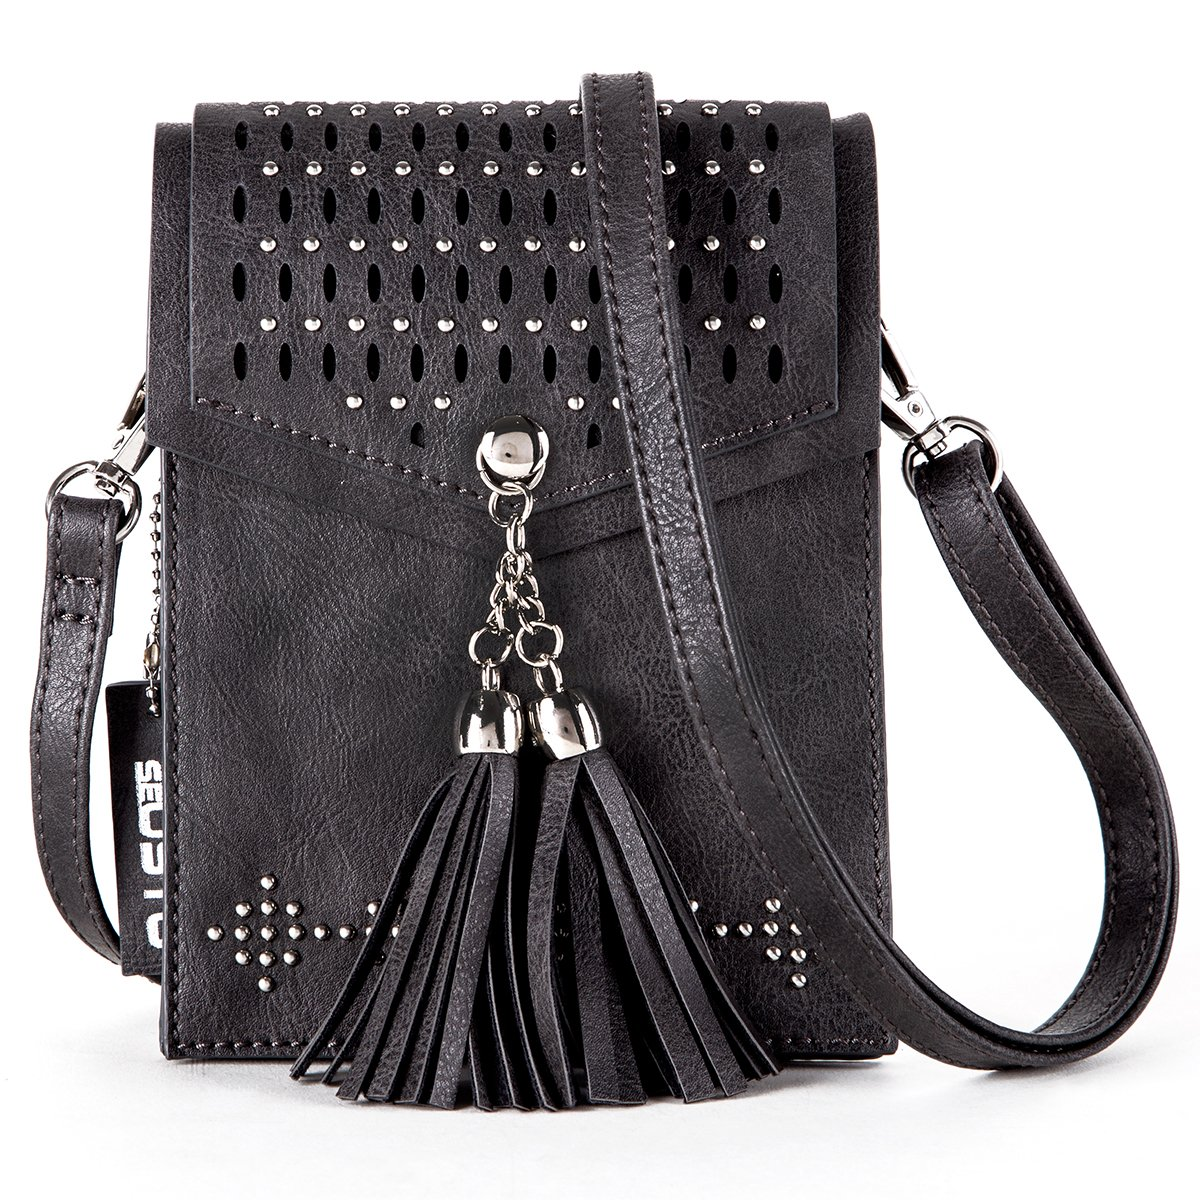 Women Small Crossbody Bag, seOSTO Tassel Cell Phone Purse Wallet Bags (Black) by seOSTO